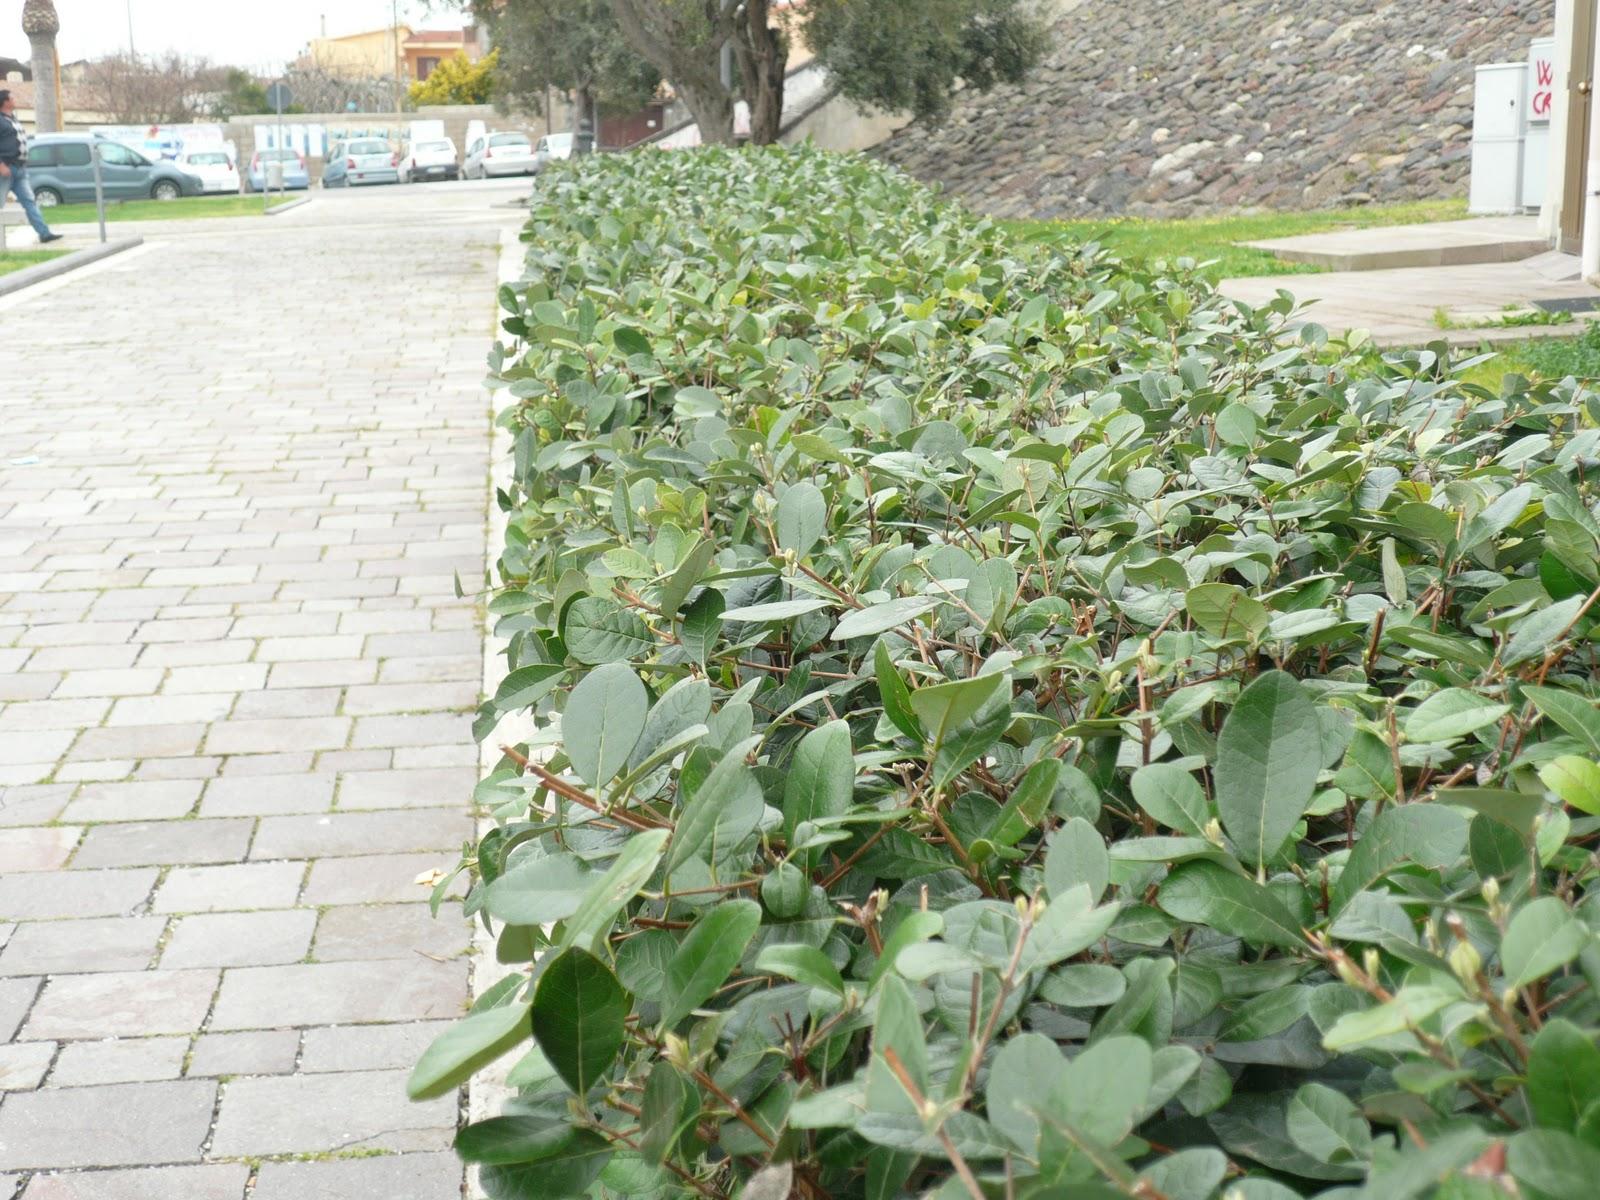 Giardini in gallura feijoa sellowiana o acca for Pianta feijoa